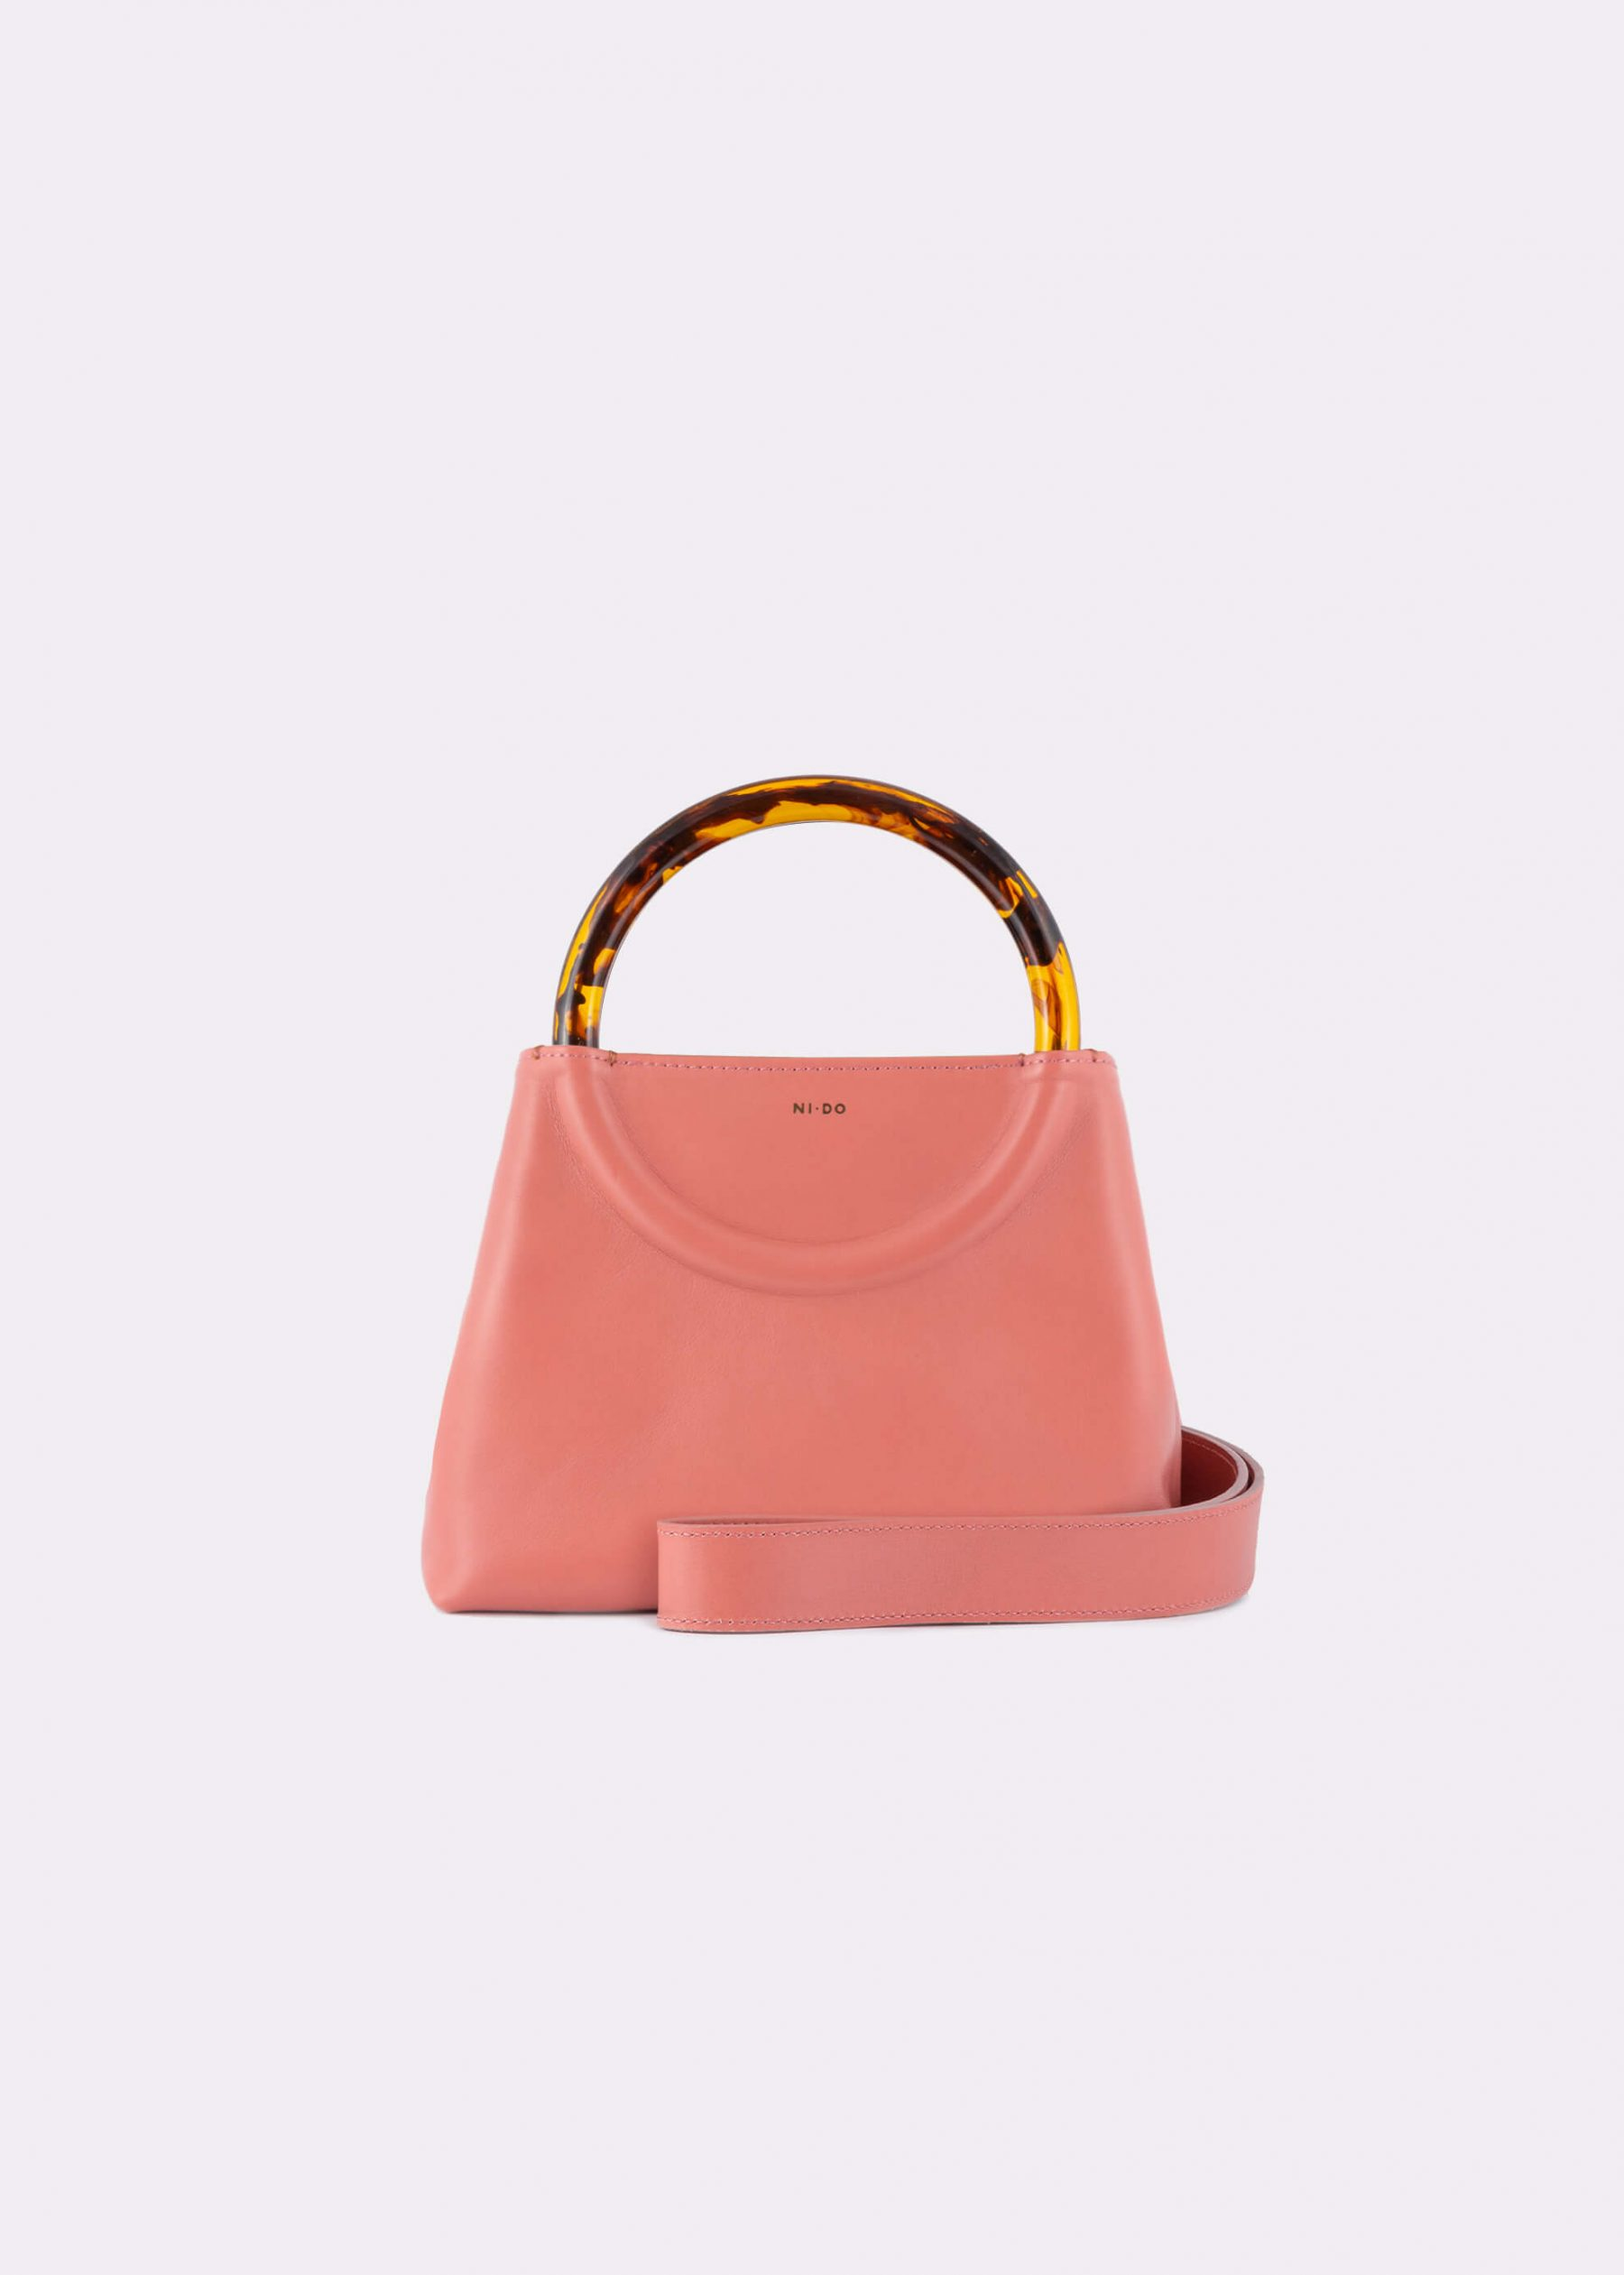 NIDO-Bolla_Mini-bag-blush_SHOULDERSTRAP view